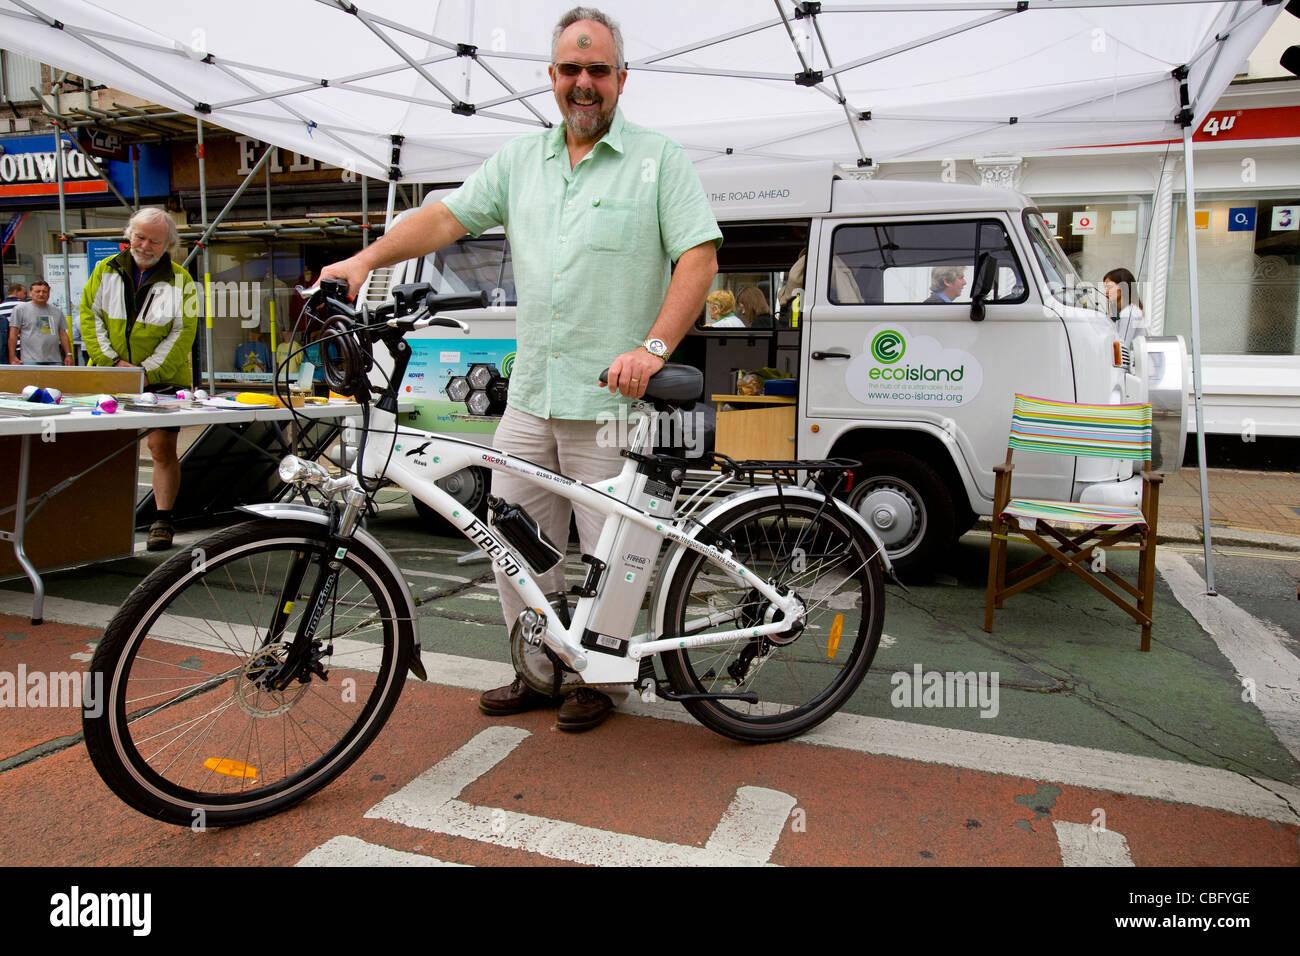 David Green, Eco Island, Isle of Wight Cycling Festival 2011. Electric Bike - Stock Image